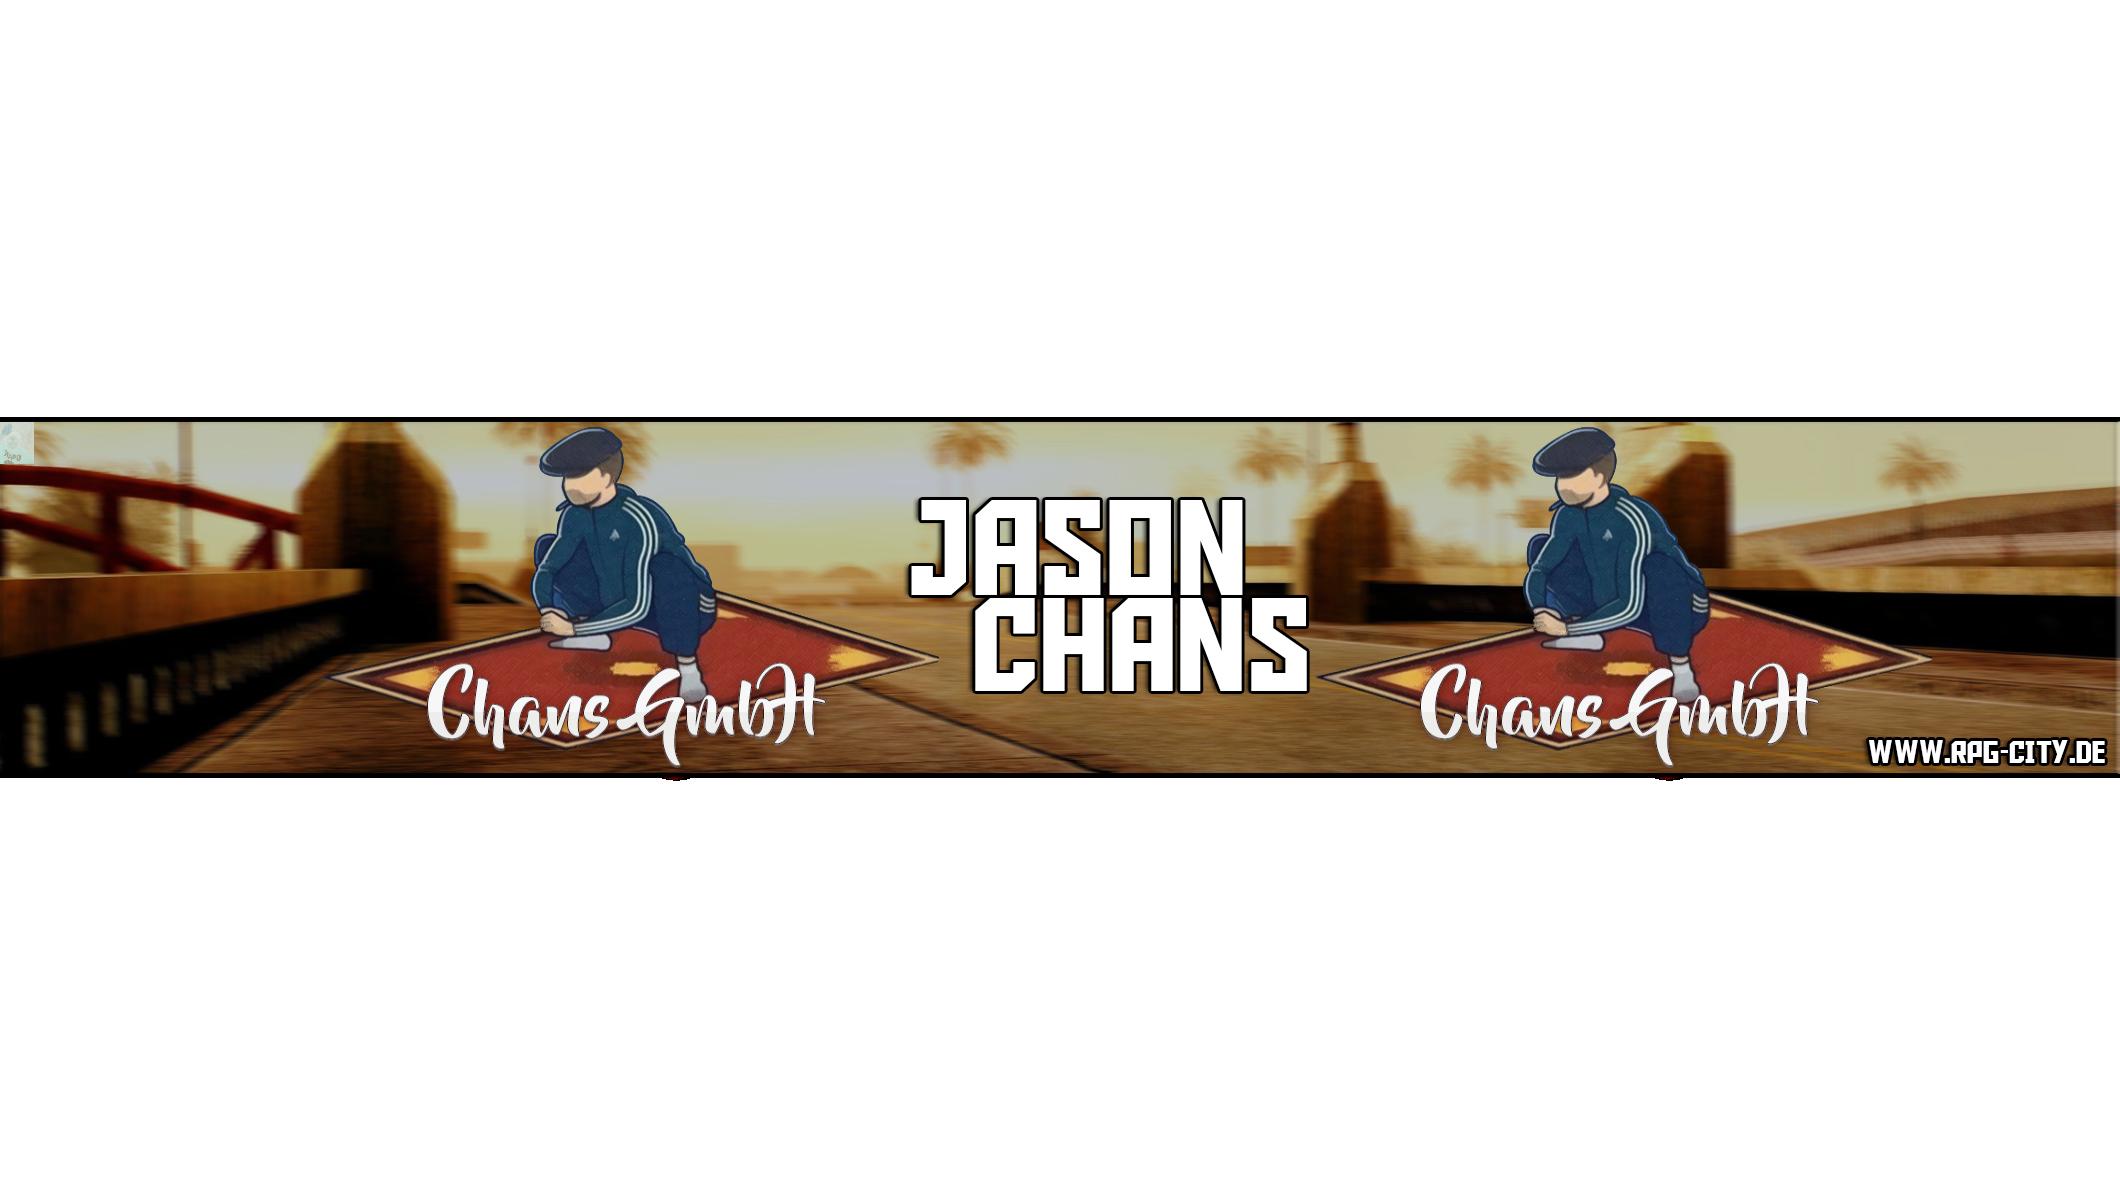 Jason-Chans-Banner8.png